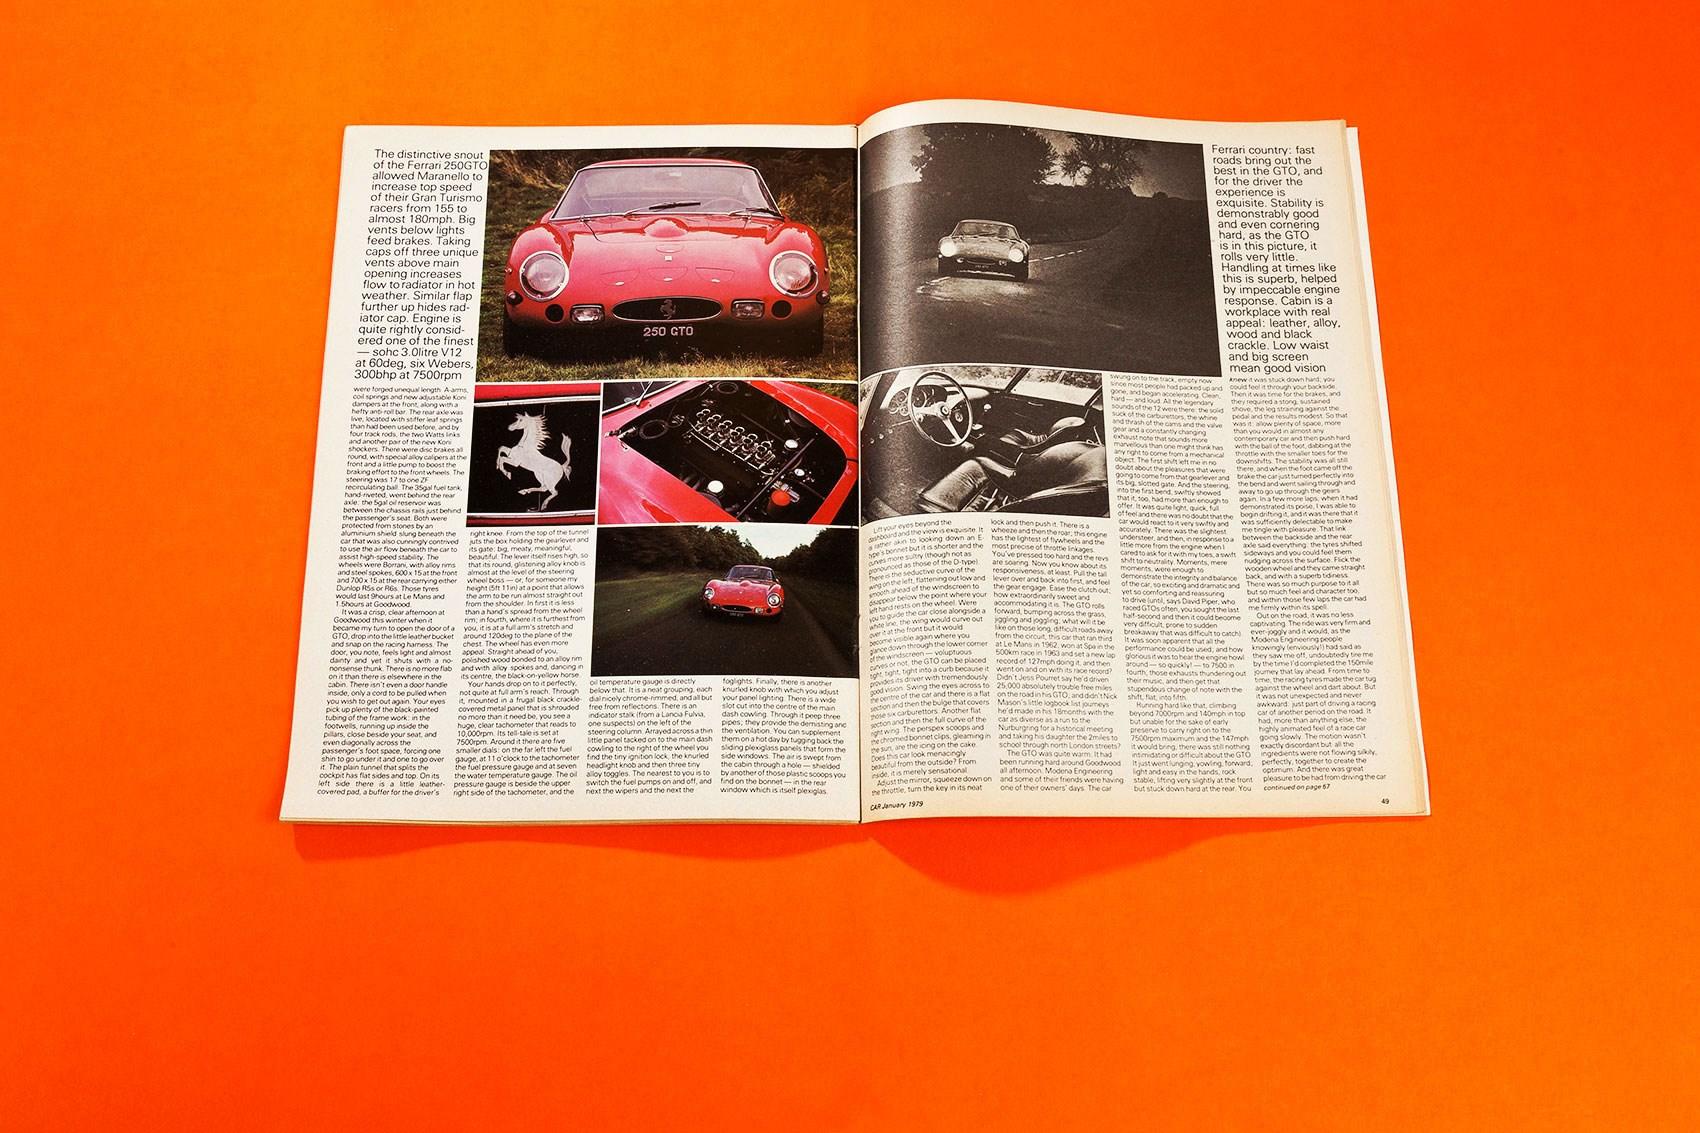 Subaru Wrx Sti 2016 Long Term Test Review Car Magazine 1964 Gto Wiring Harness Radio The Last Front Engine Ferrari Racing Makes It So Special